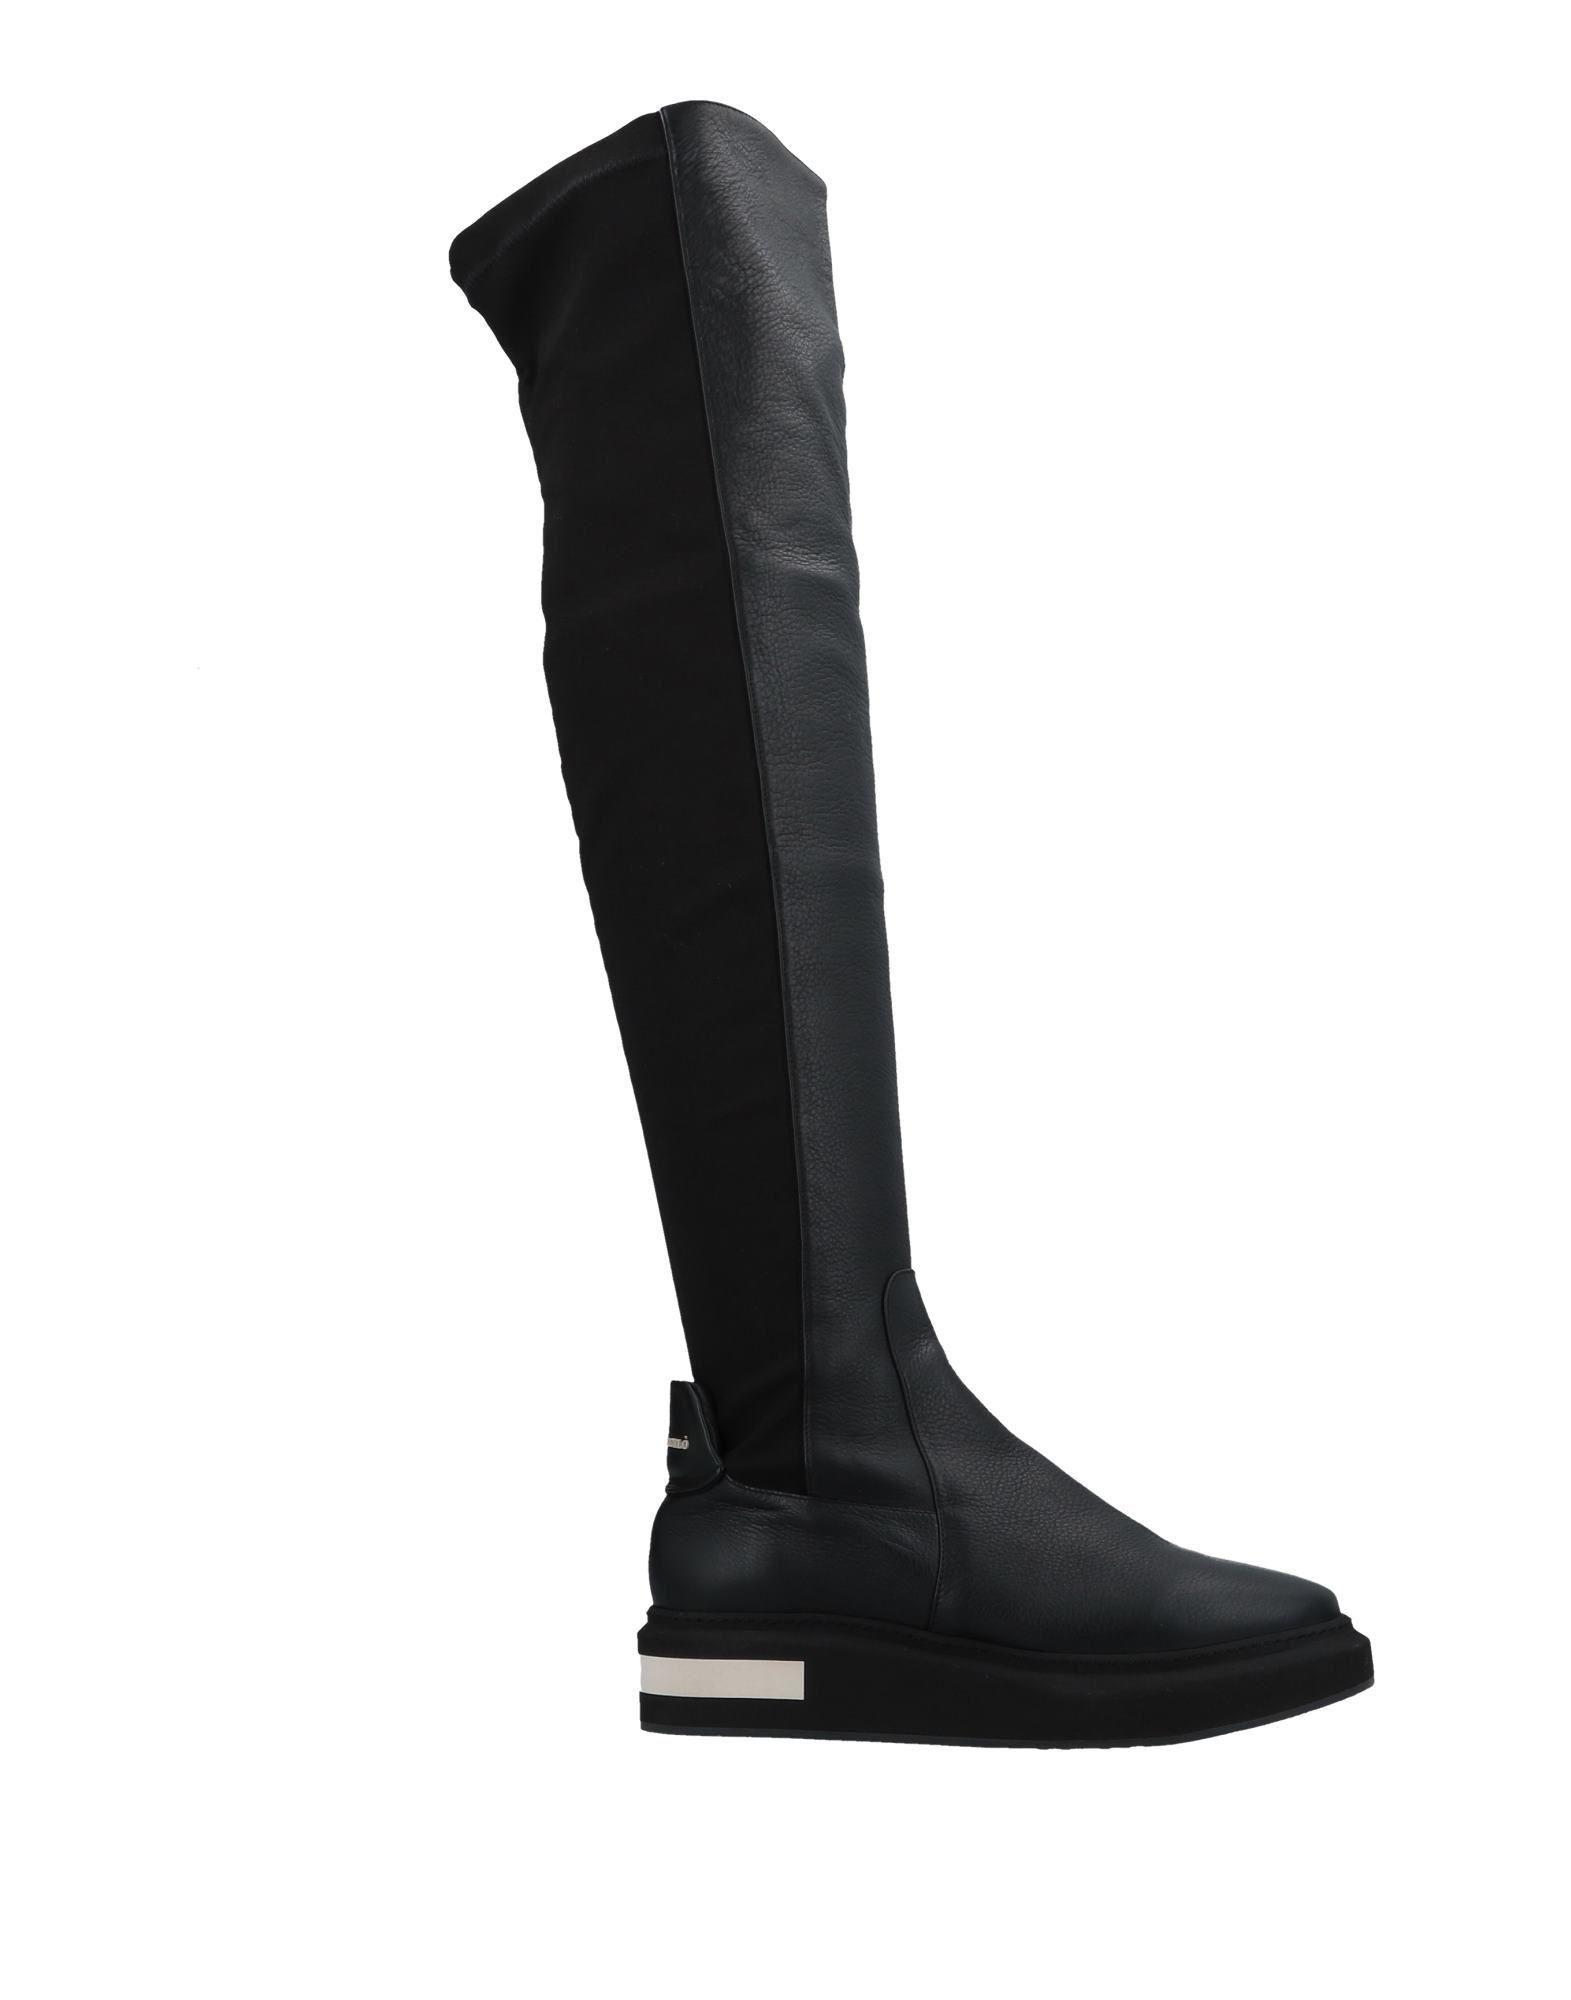 Manuel Barceló Stiefel Damen  11512548WR Neue Schuhe